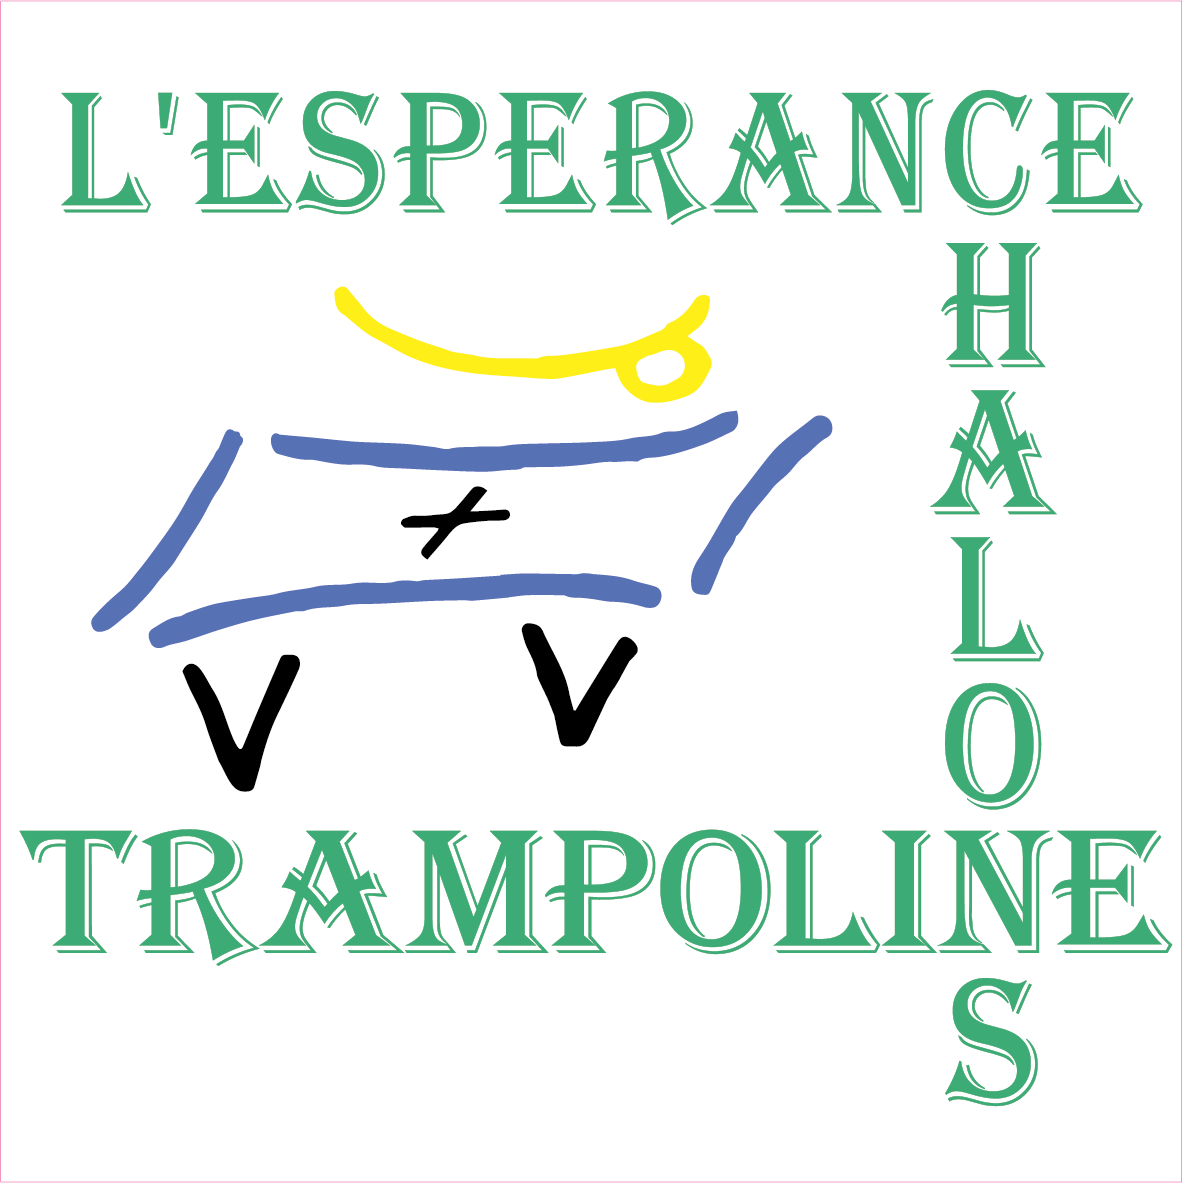 Logo trampoline 2019 01 3